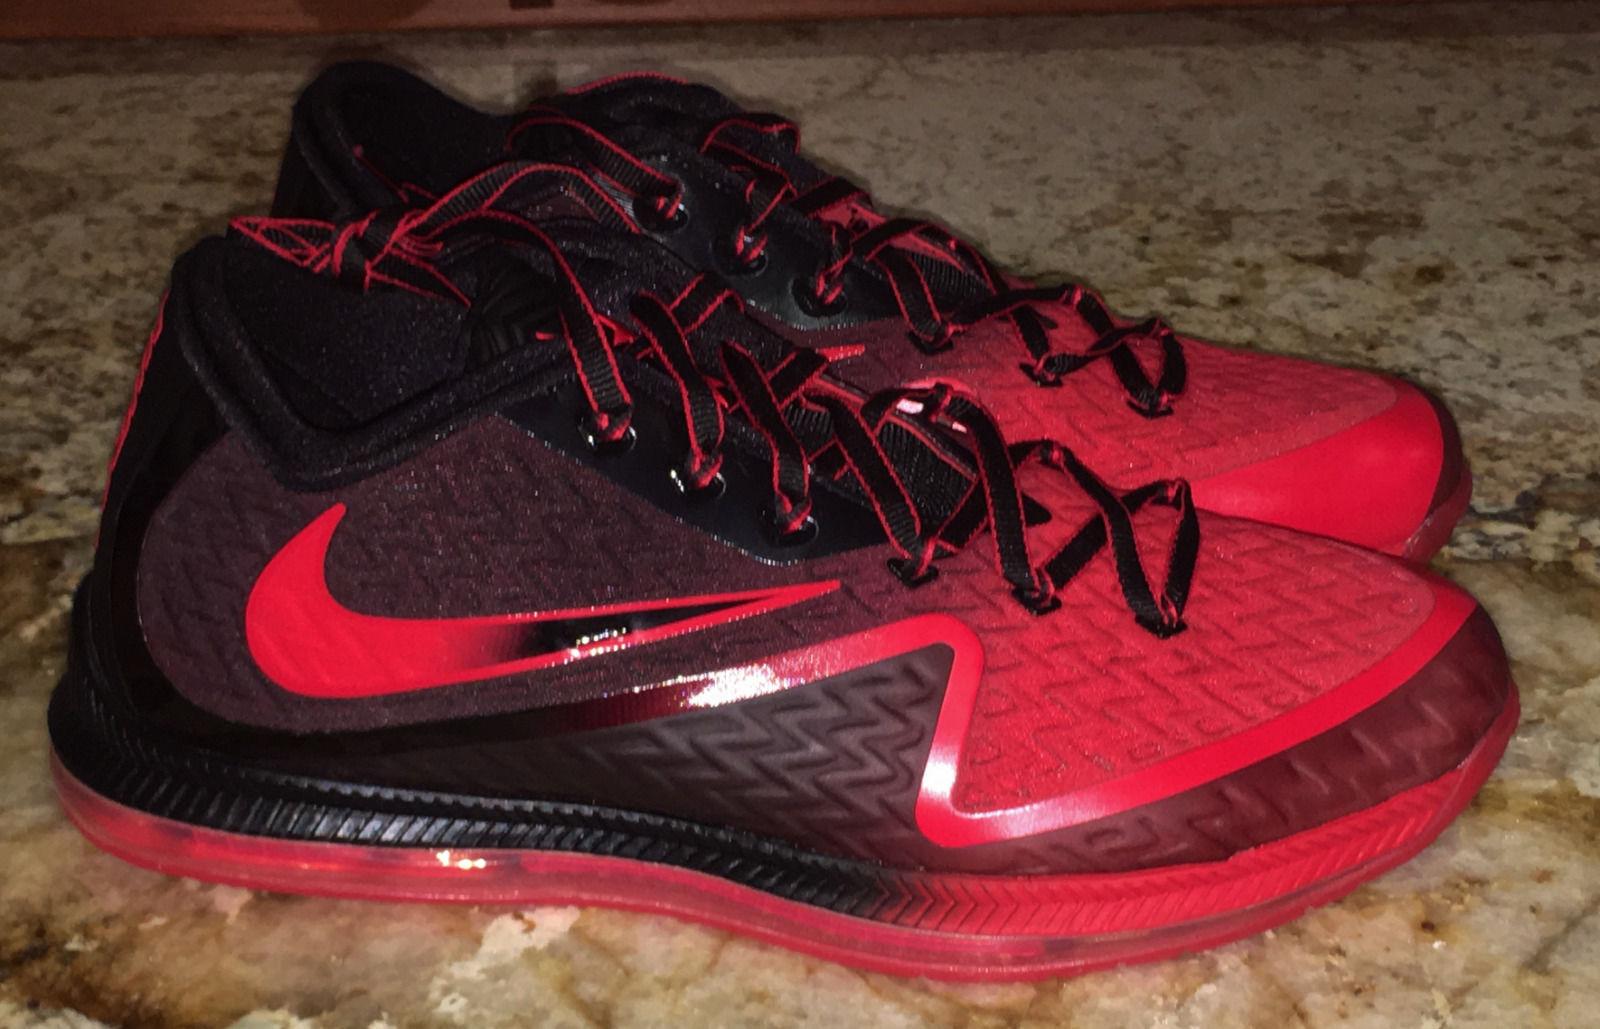 NIKE Field General 2 Football Red Black QB Training shoes NEW Mens Sz 10 13